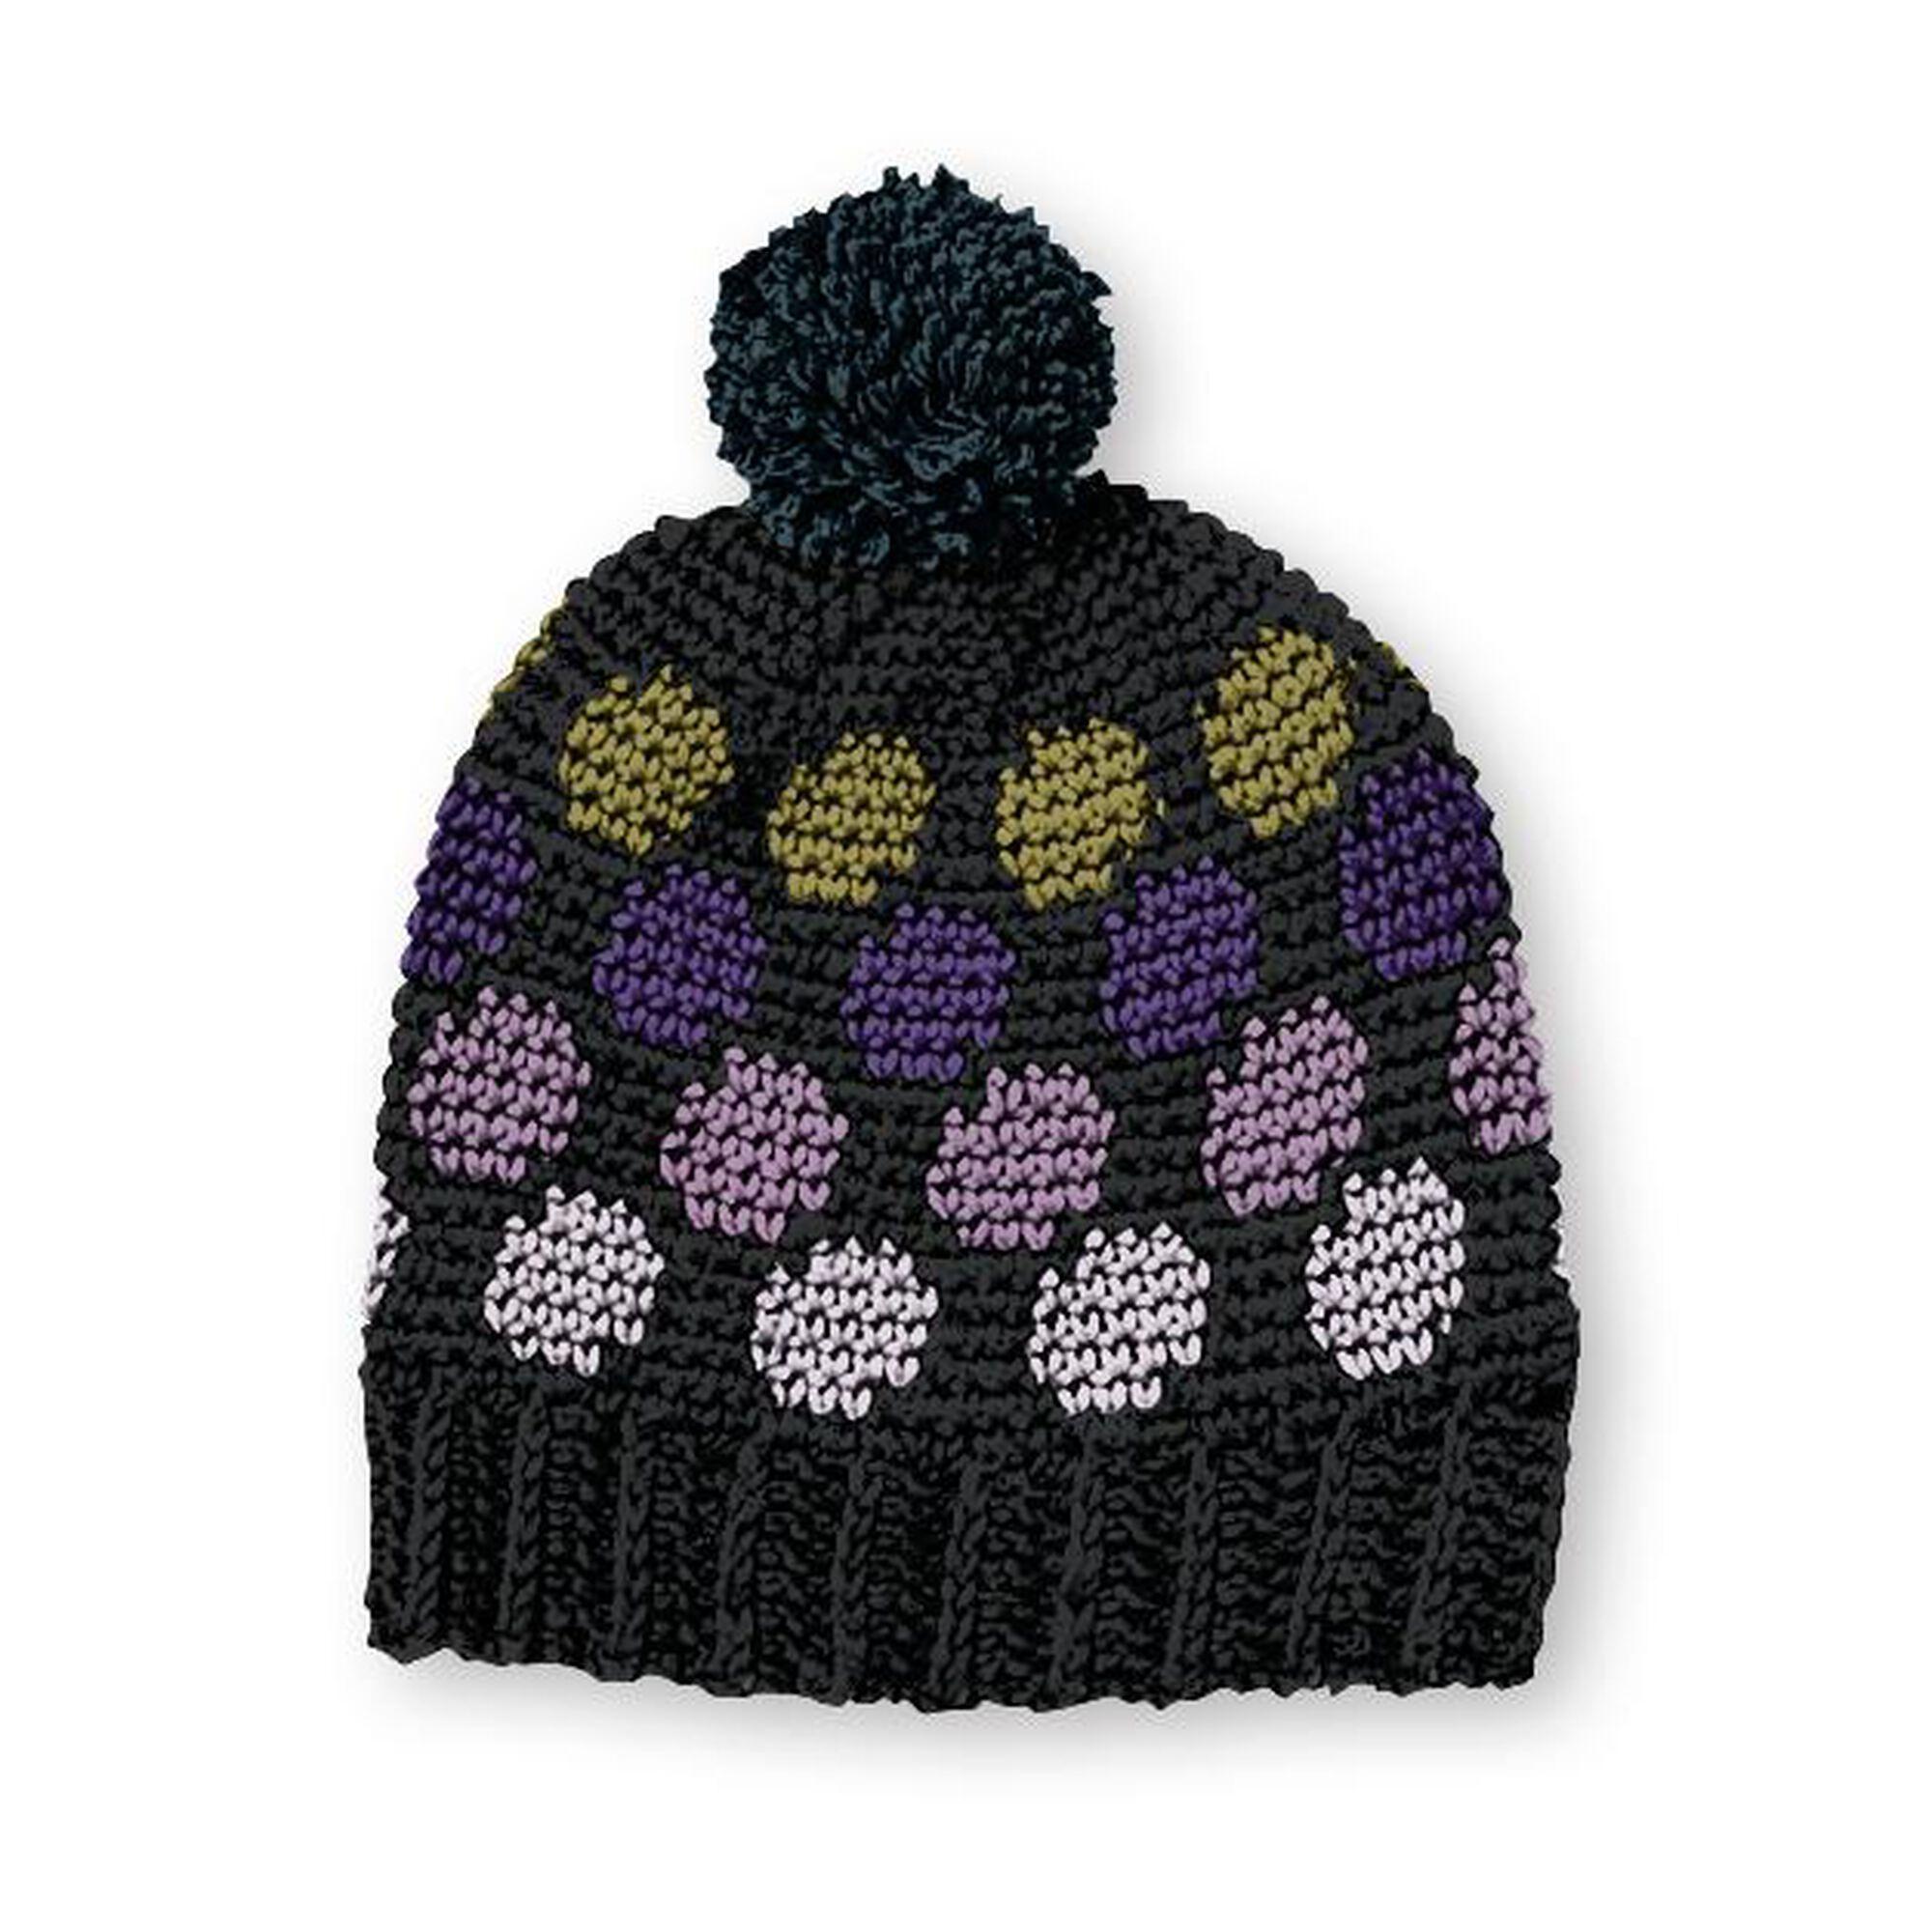 5baddc4ec14 More Inspirational Images. Caron x Pantone Polka-Dotty Crochet Hat ...